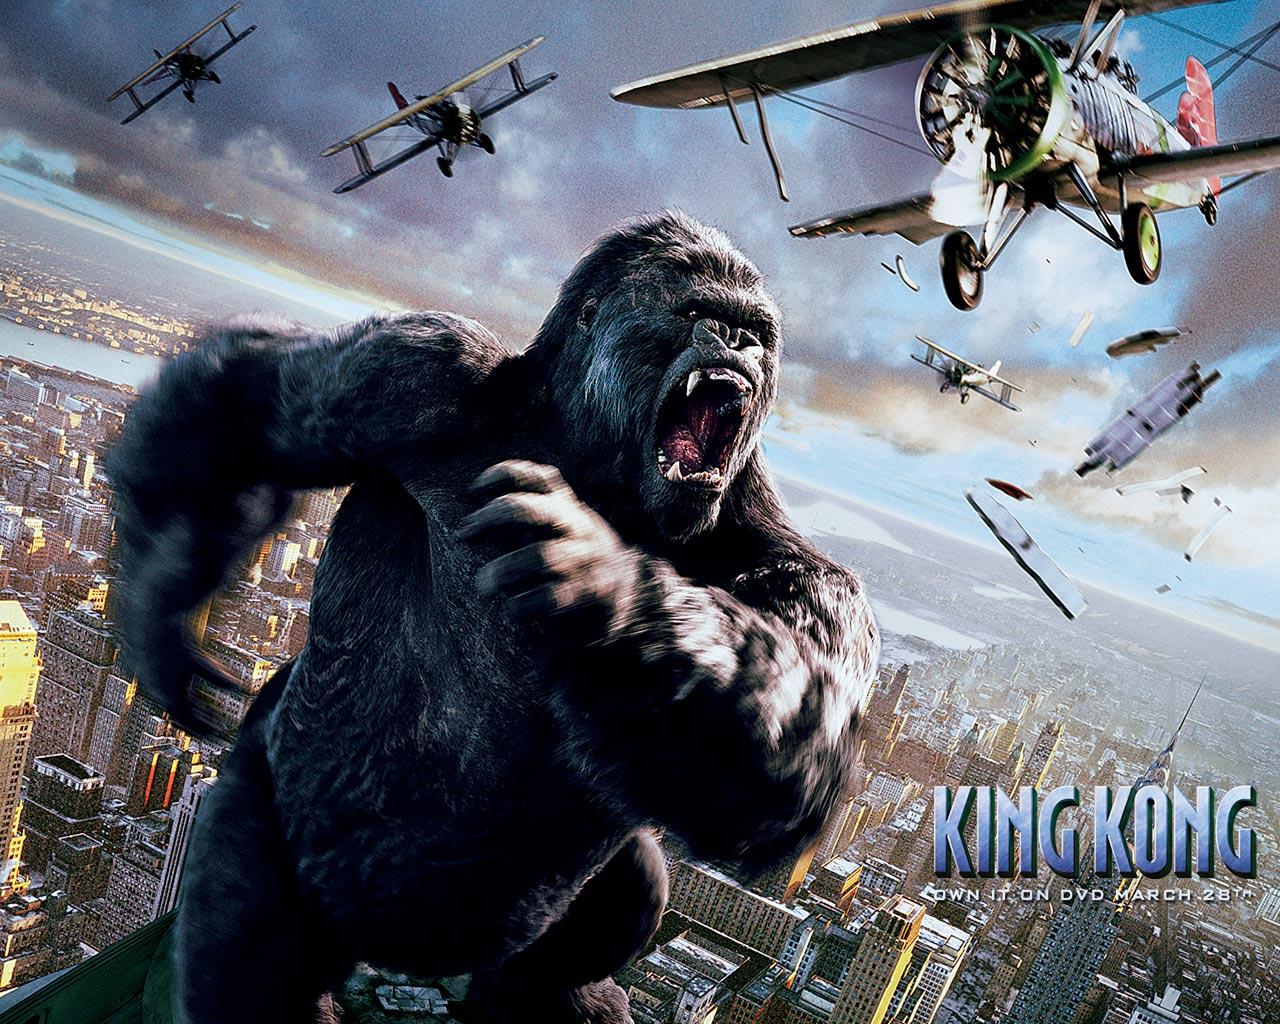 King_Kong%252C_2005%252C_Jack_Black.jpg